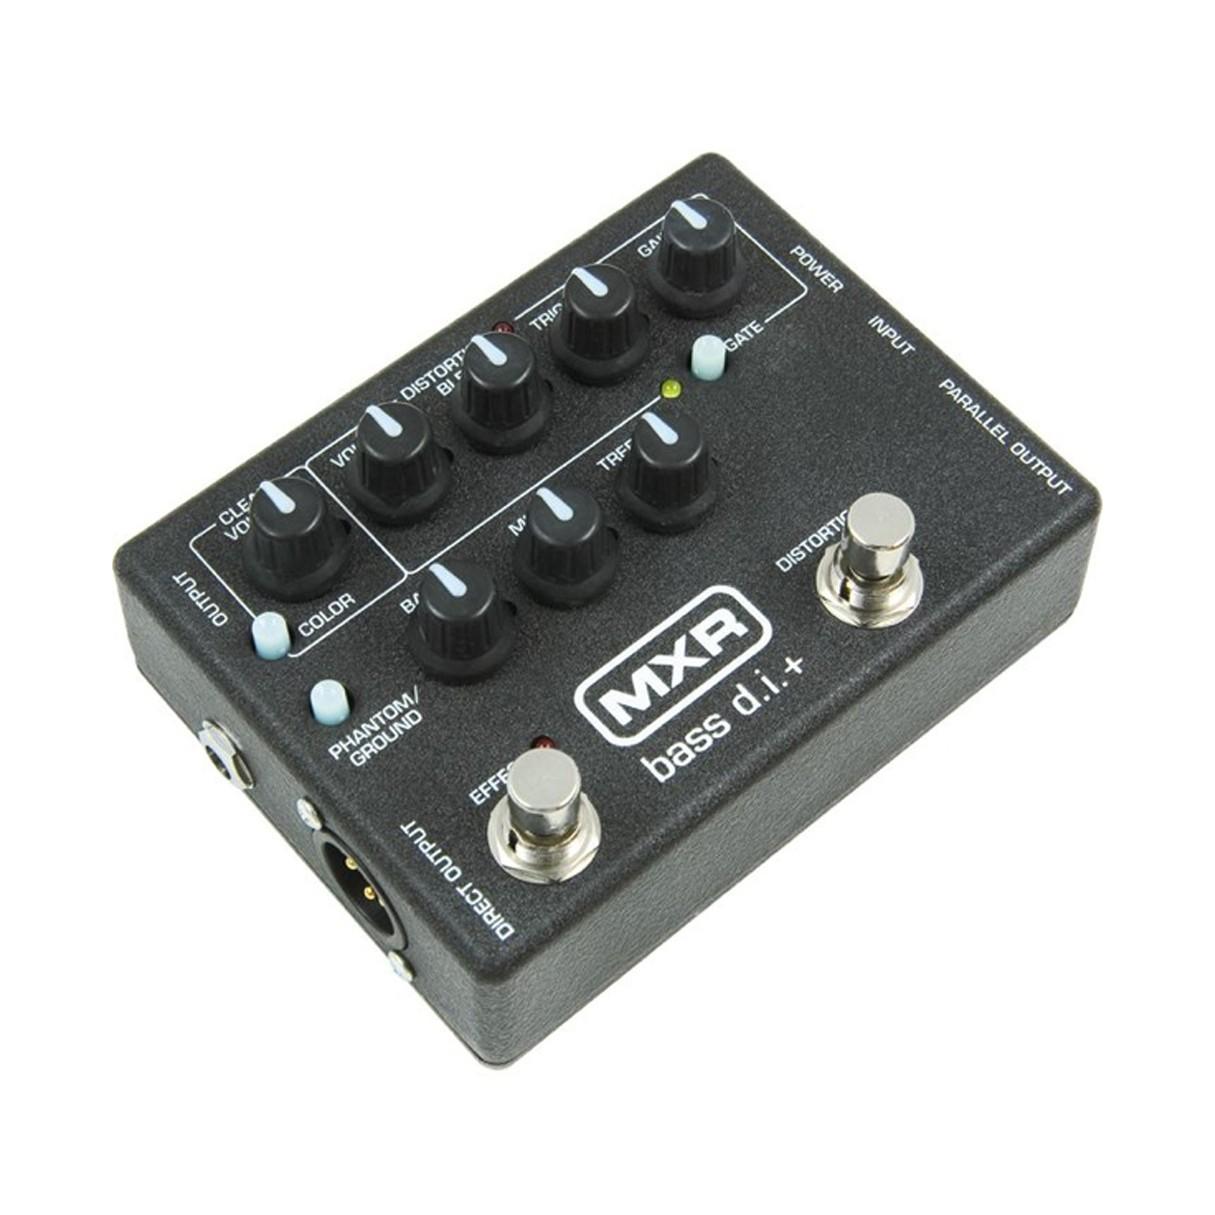 mxr m80 bass direct box with distortion